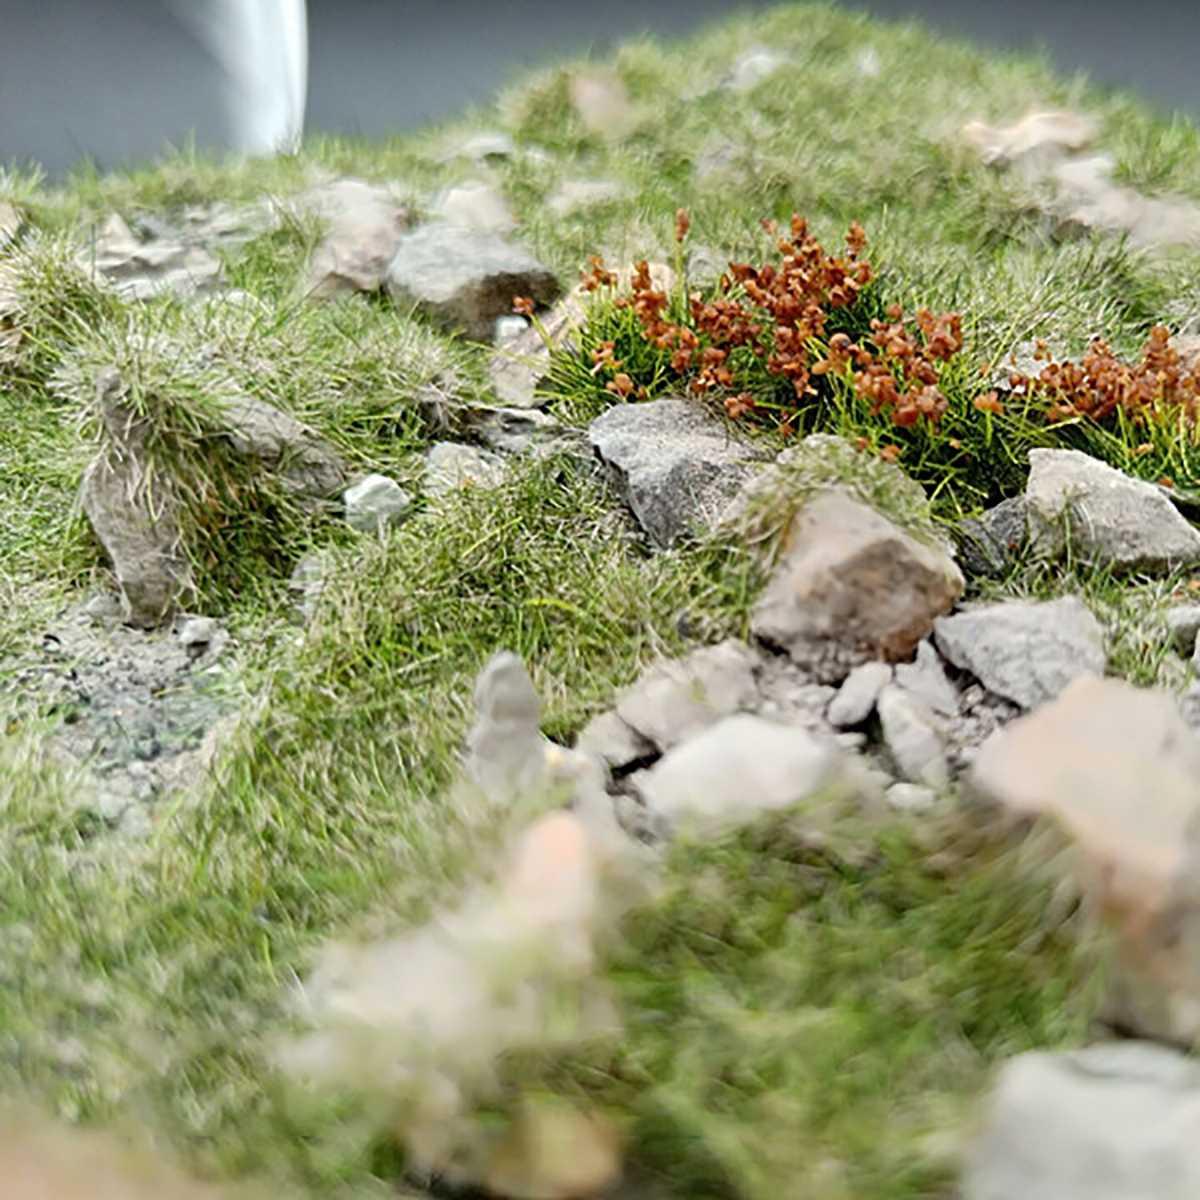 Sand Table Model Vegetation Static Grass Layout Building Scenery Landscape